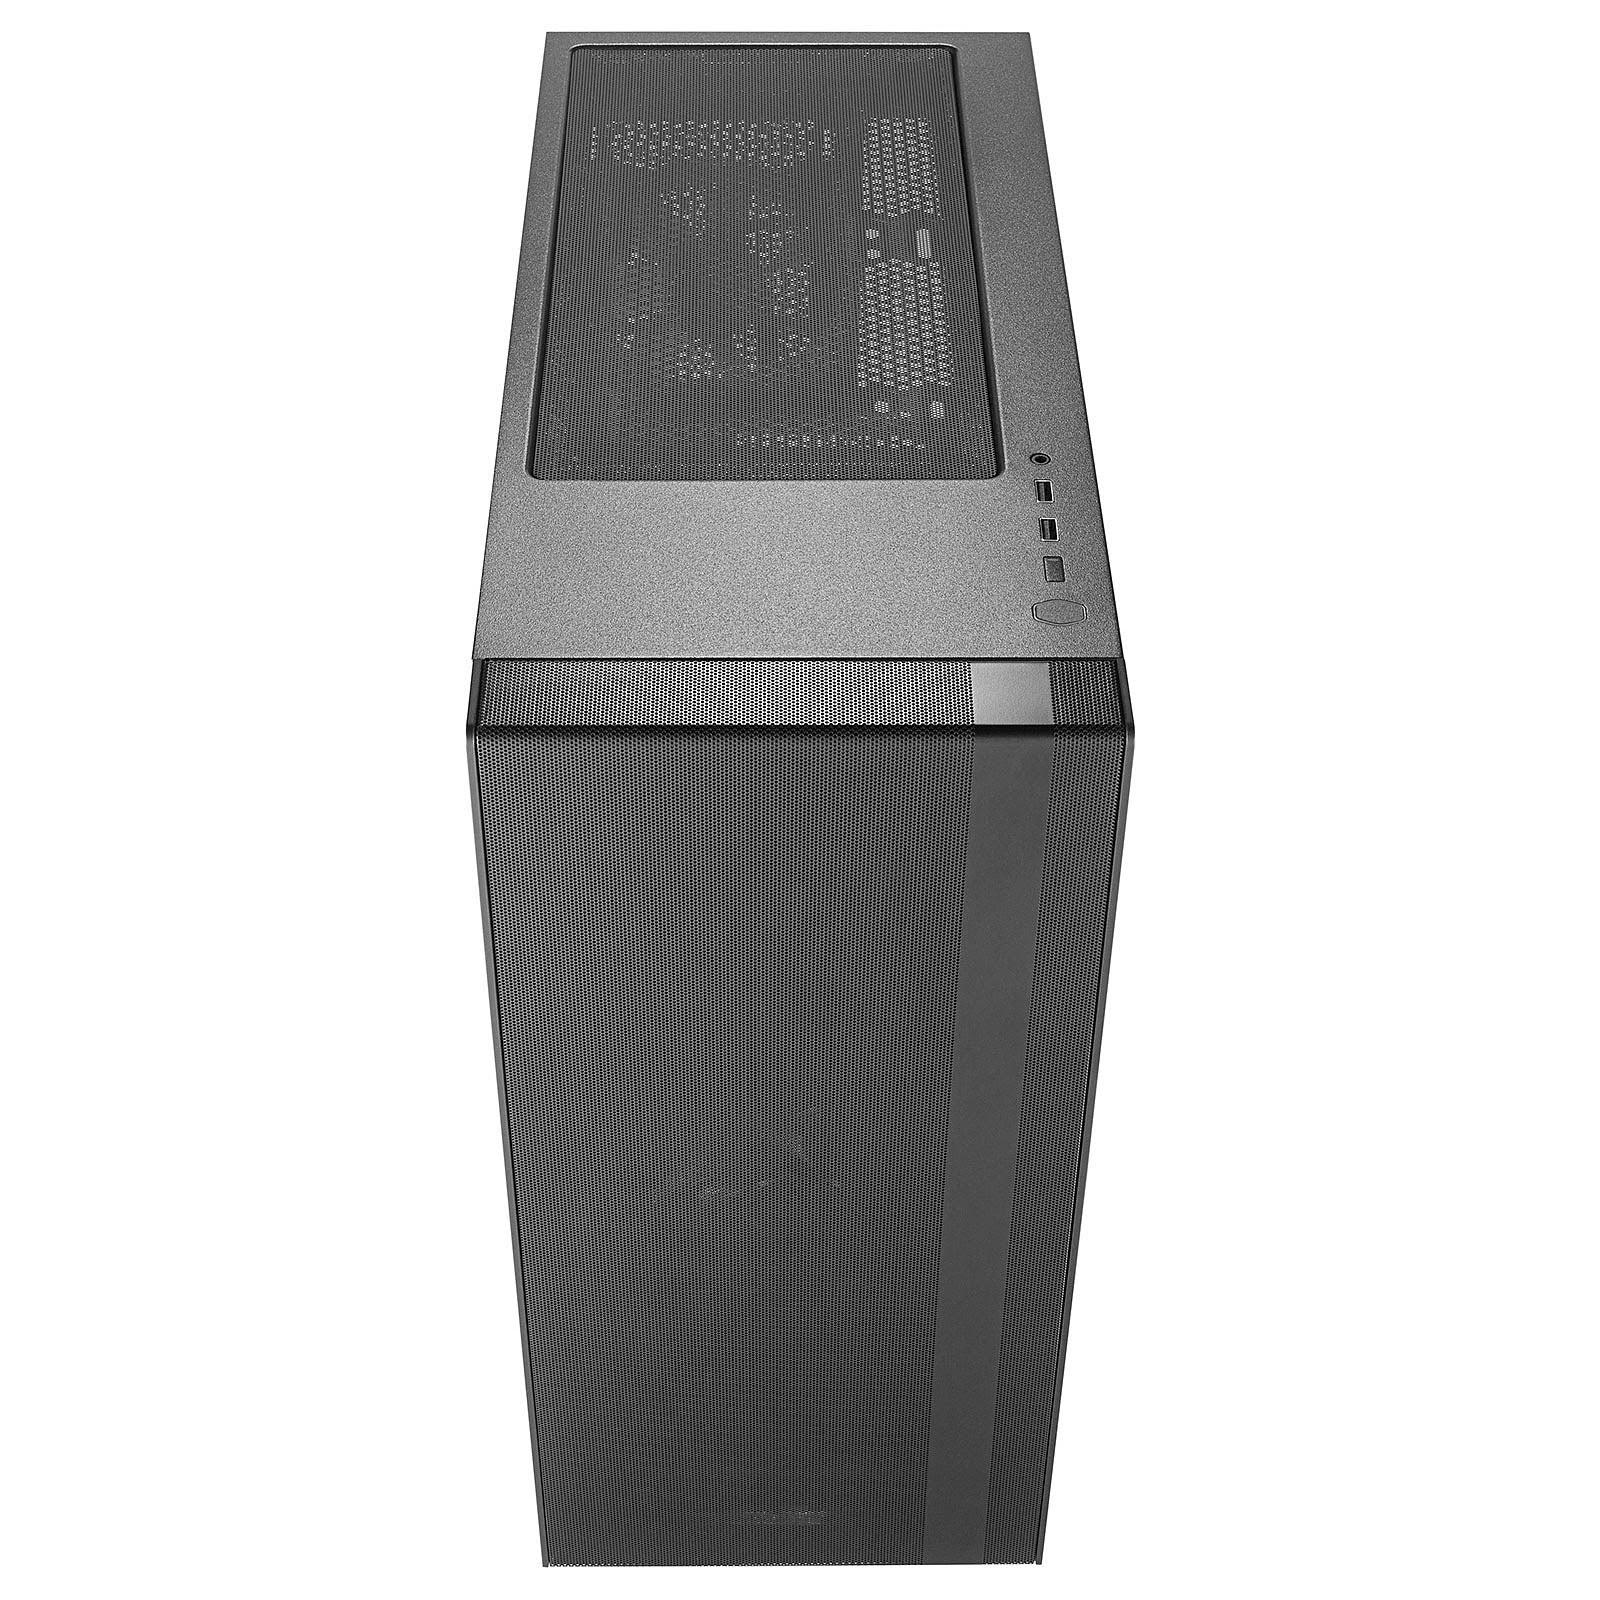 Cooler Master MasterBox NR600 MCB-NR600-KGNN-S00 Noir - Boîtier PC - 1